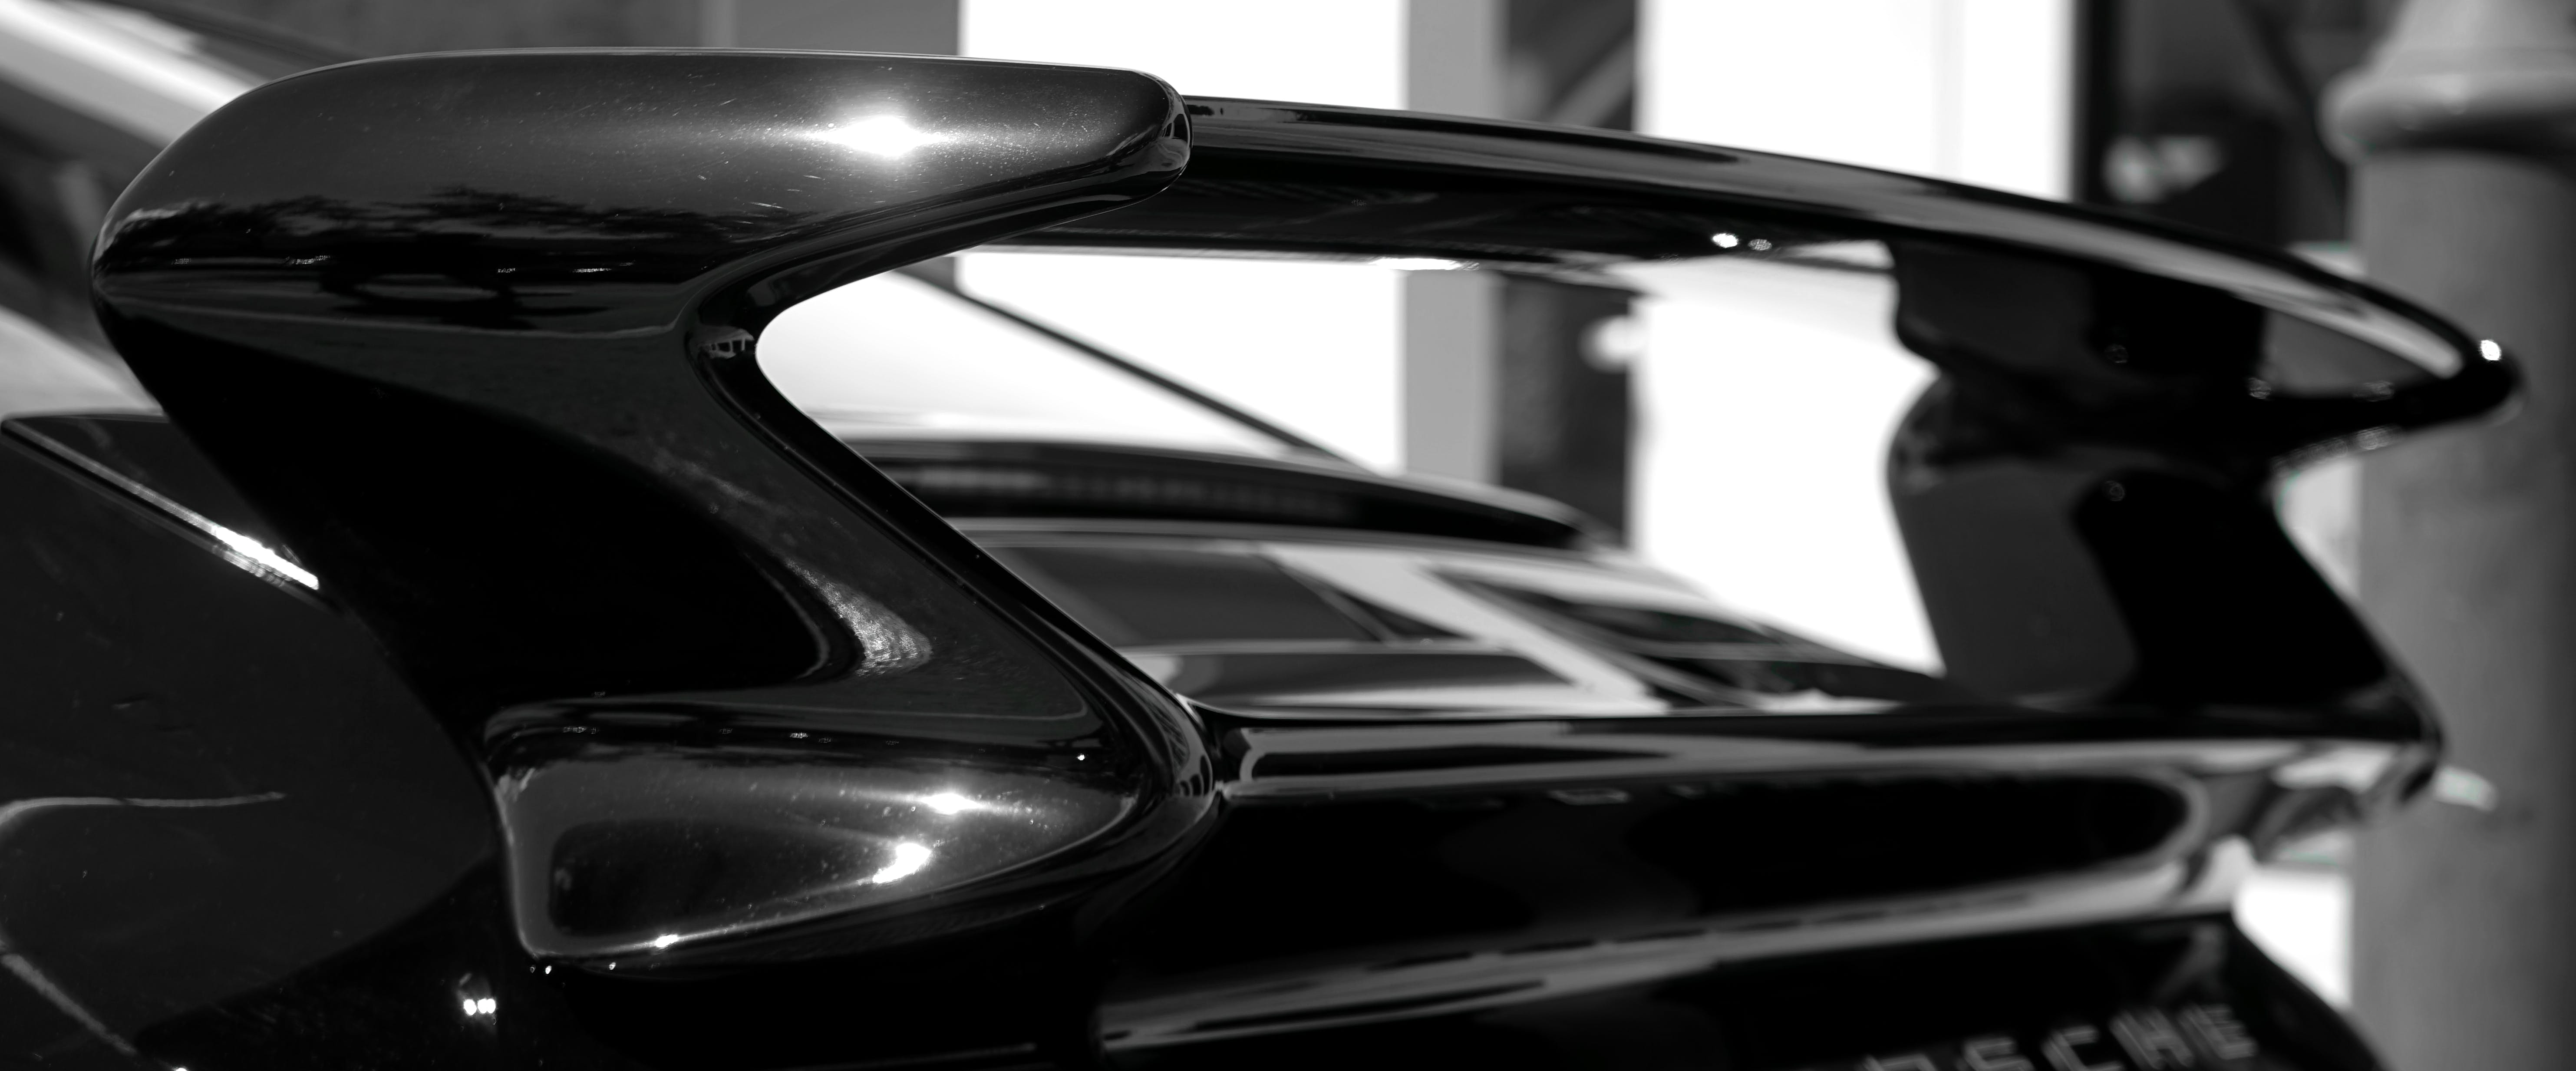 Free stock photo of cars, porsche